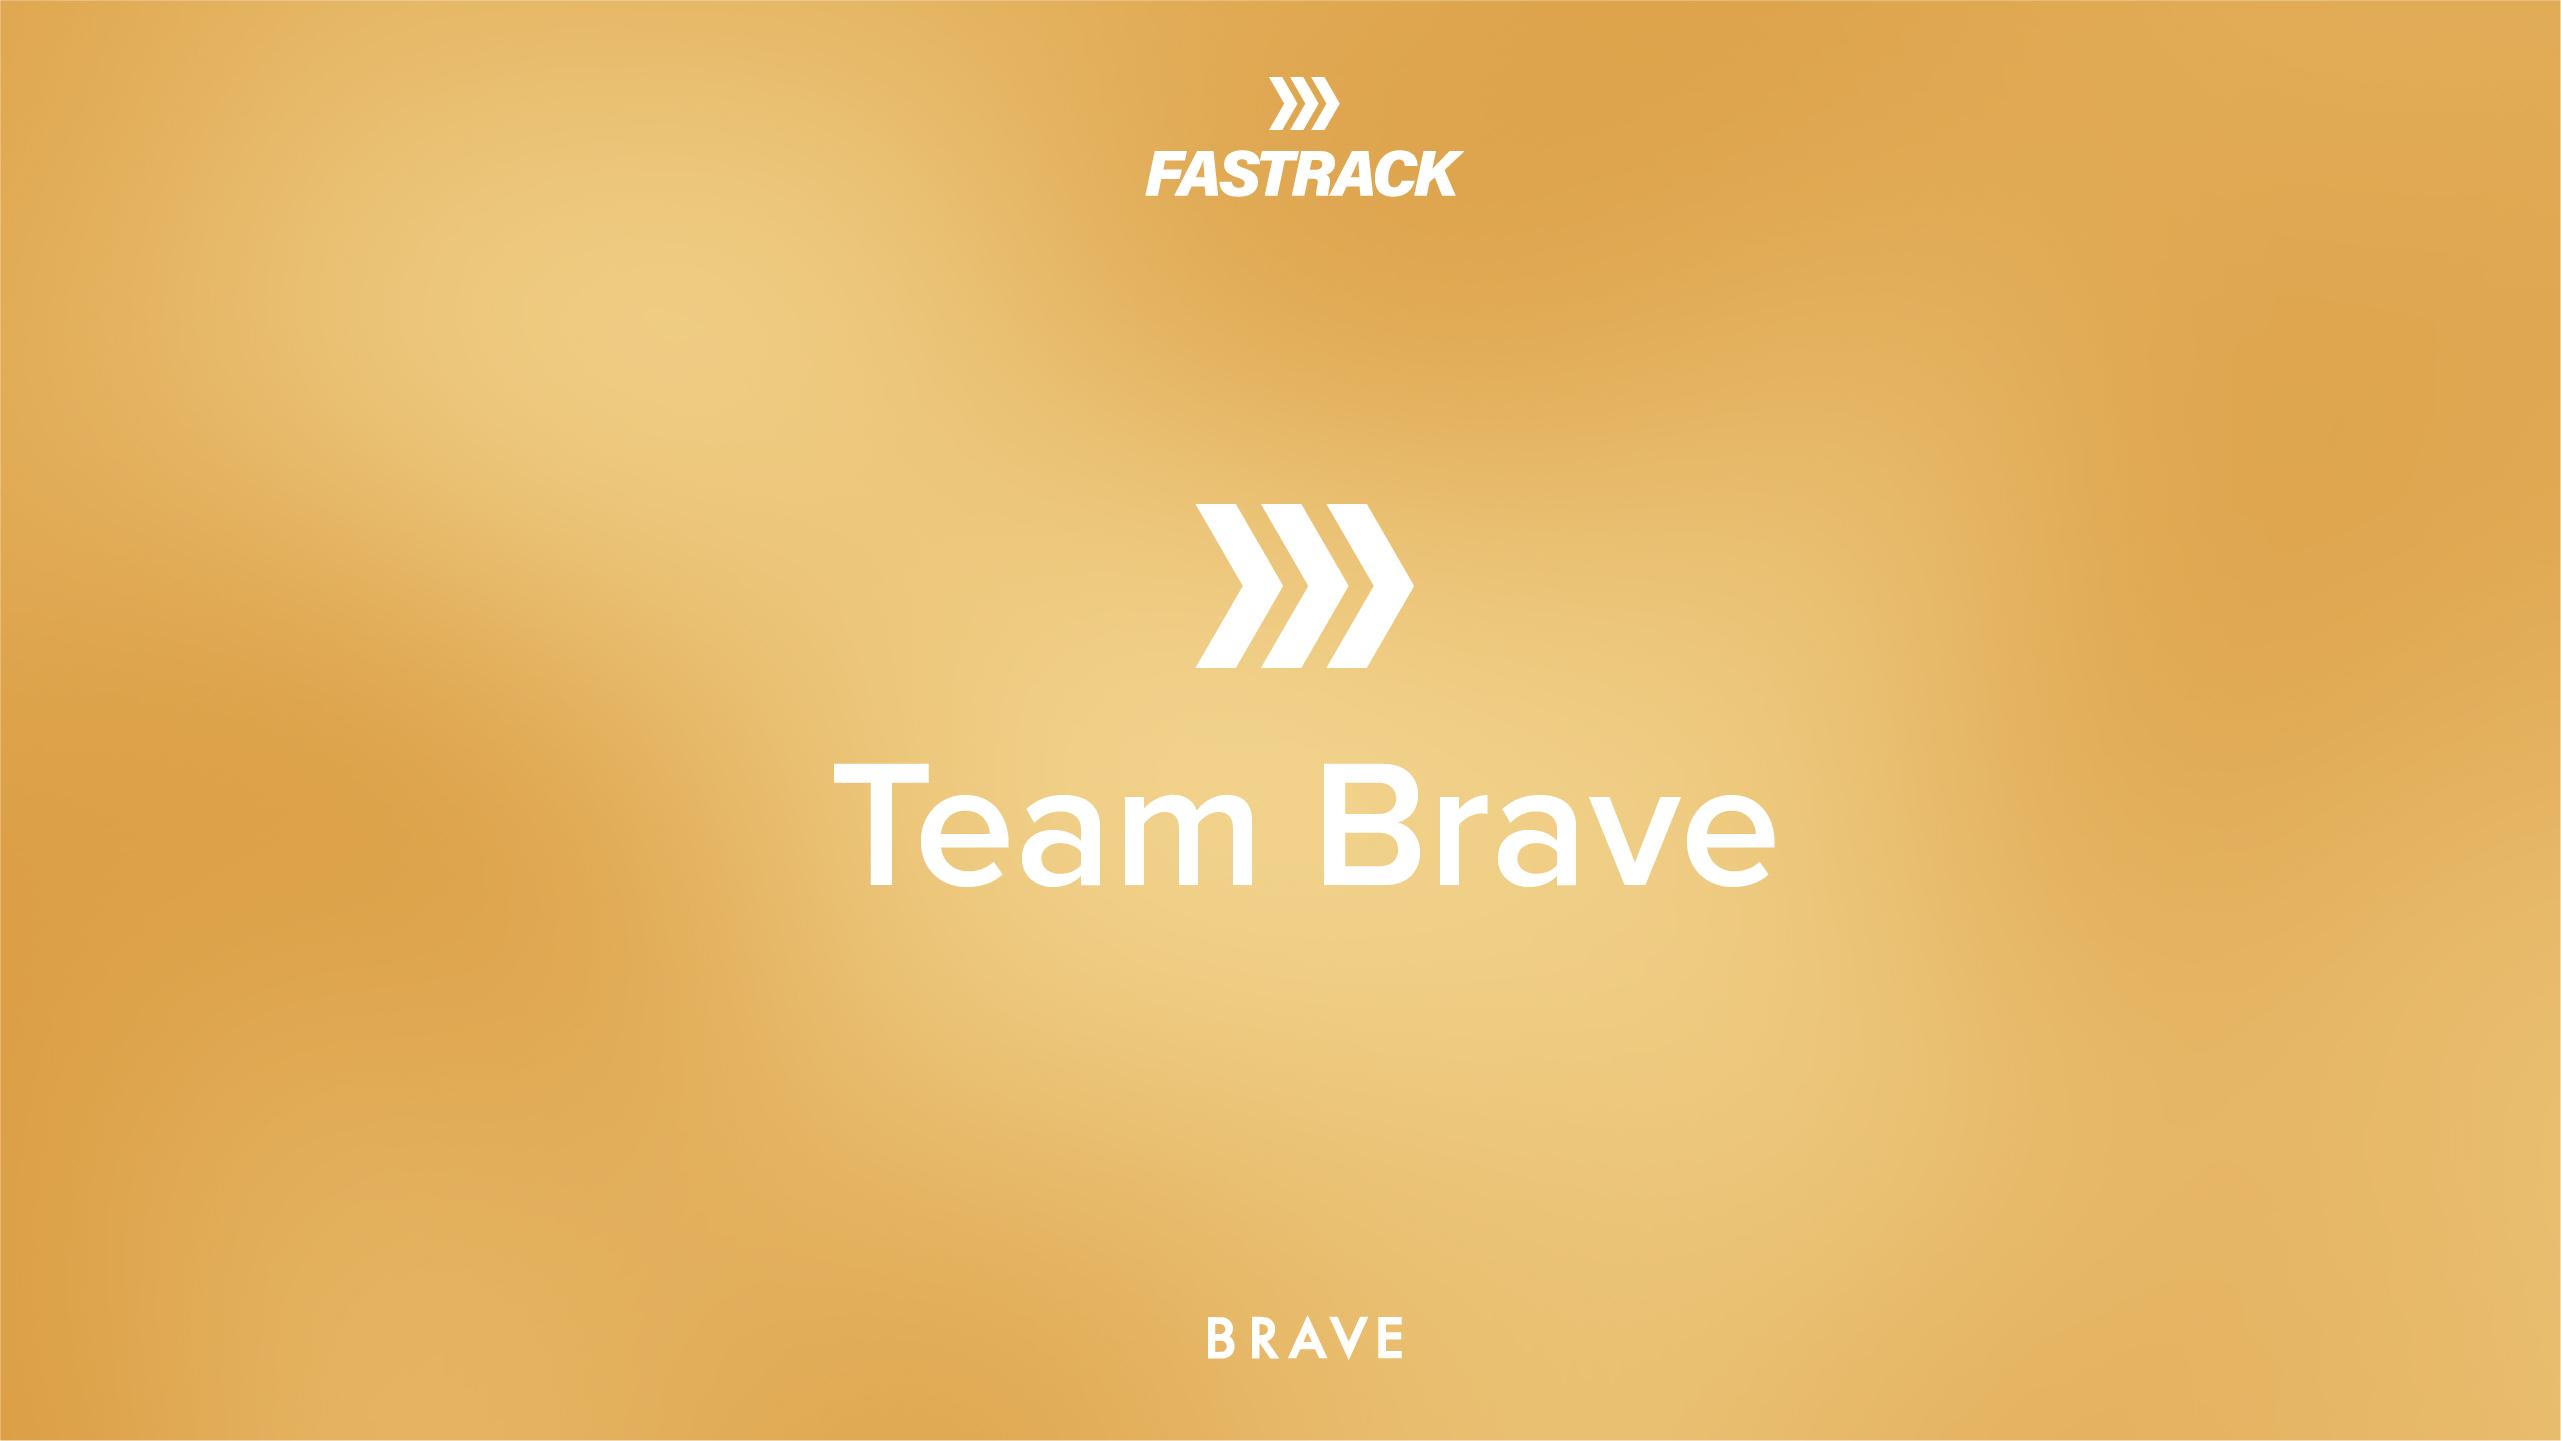 Teamfasttrack